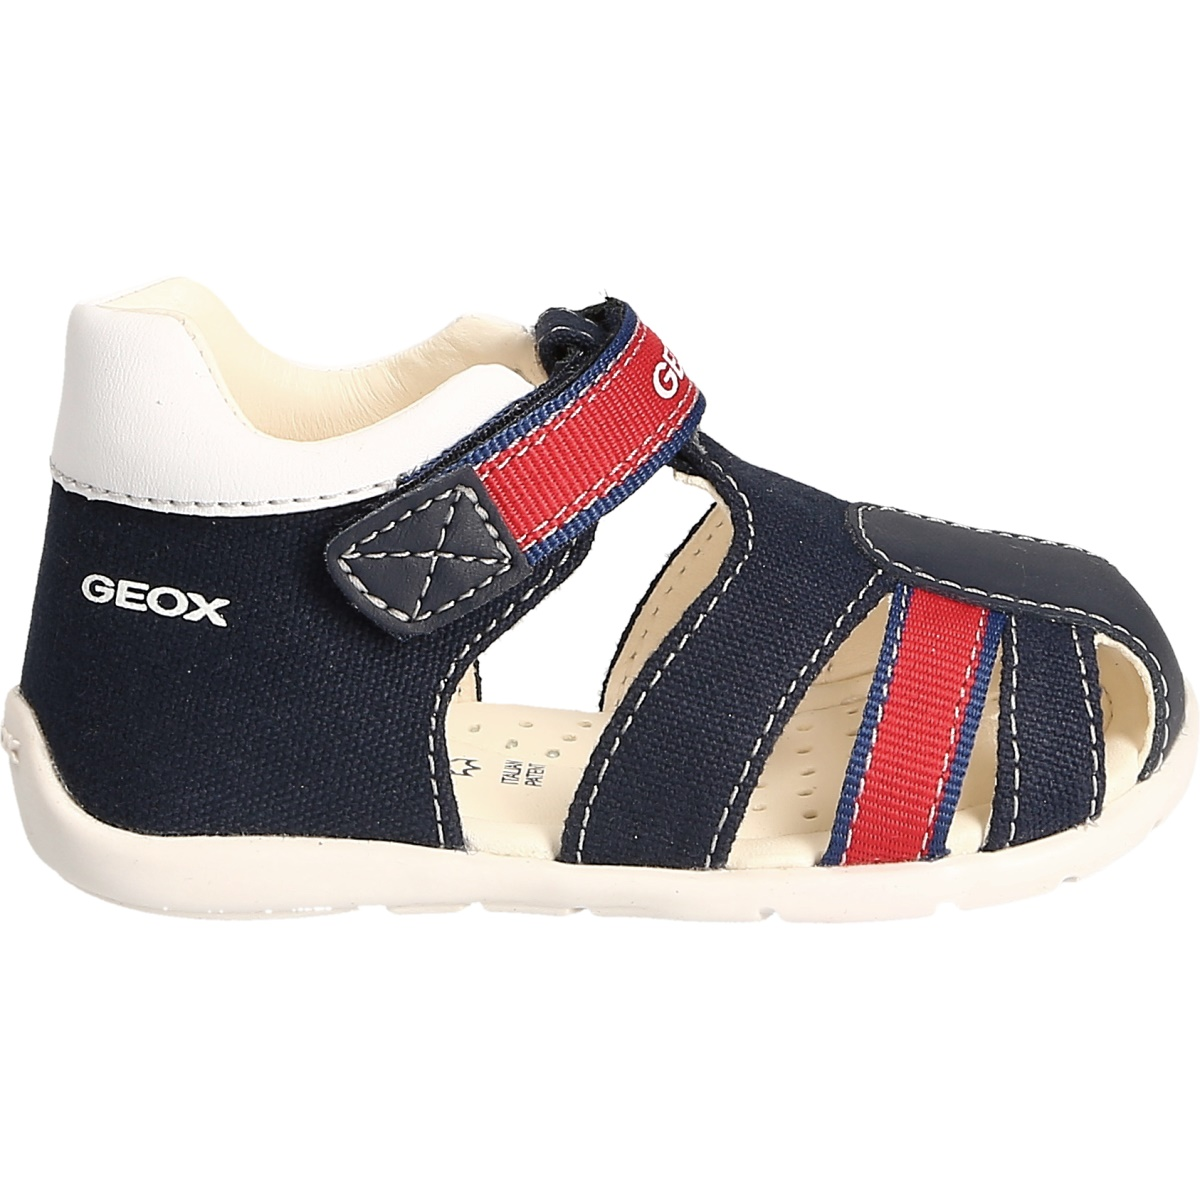 Kinderschuhe Sandaletten GEOX B821PA 01054 C0735 ELTHAN im